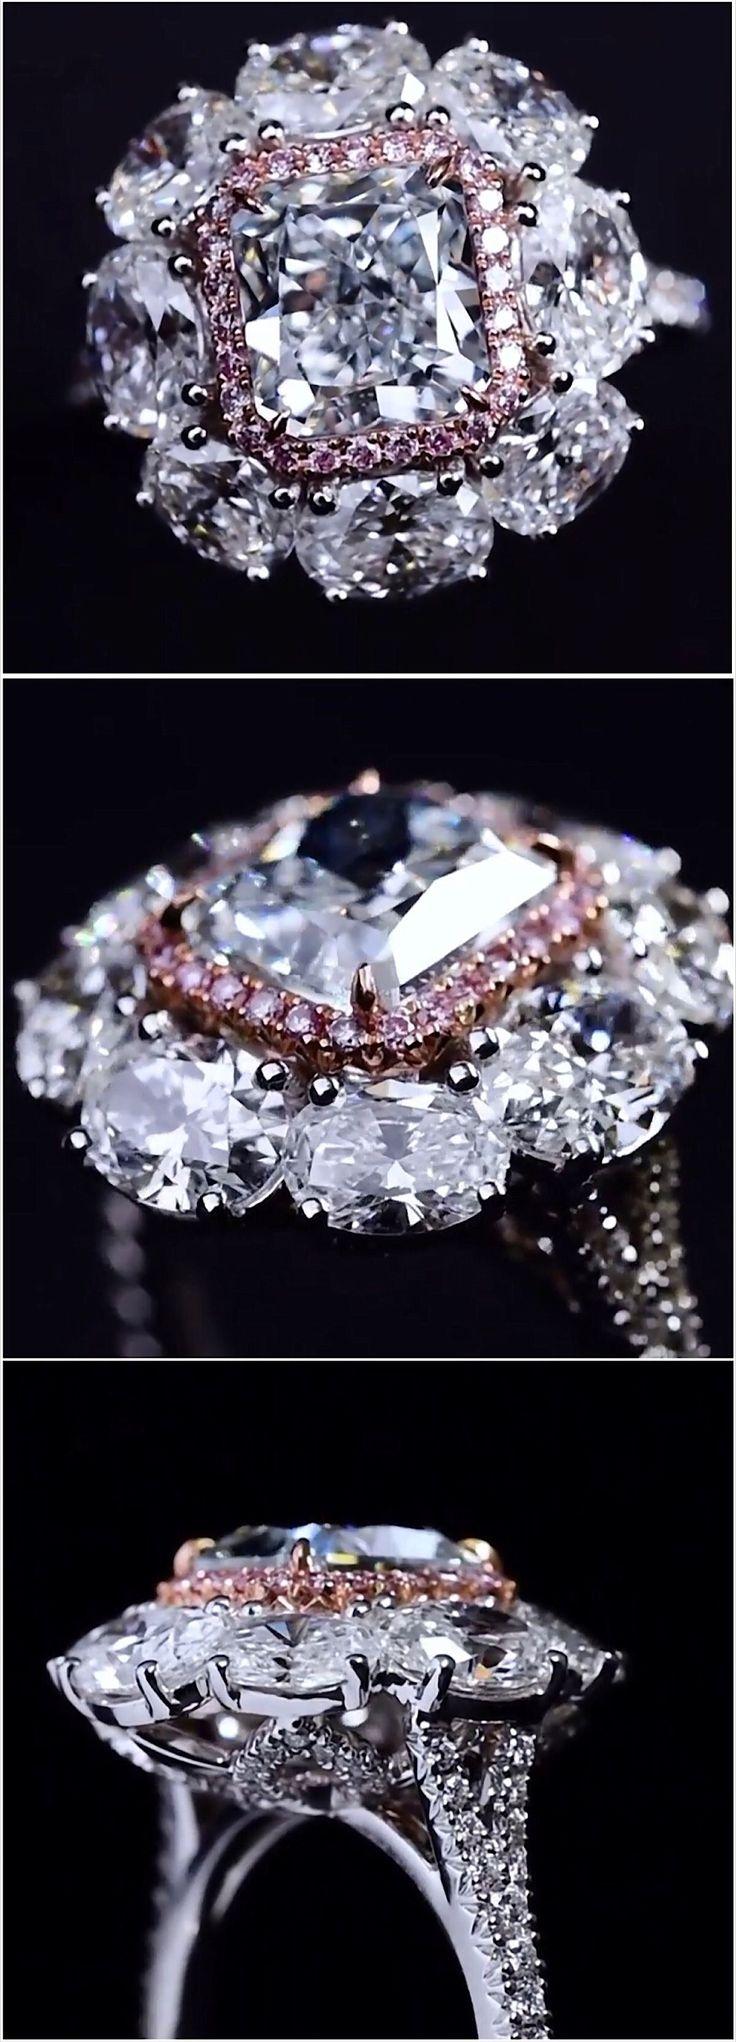 #BlueDiamond, one of the rarest color of natural color #diamond. Here is the stunning 2ct Fancy Light Greenish Blue VVS2 ring by Edelman Diamond https://www.instagram.com/edelman_diamond/